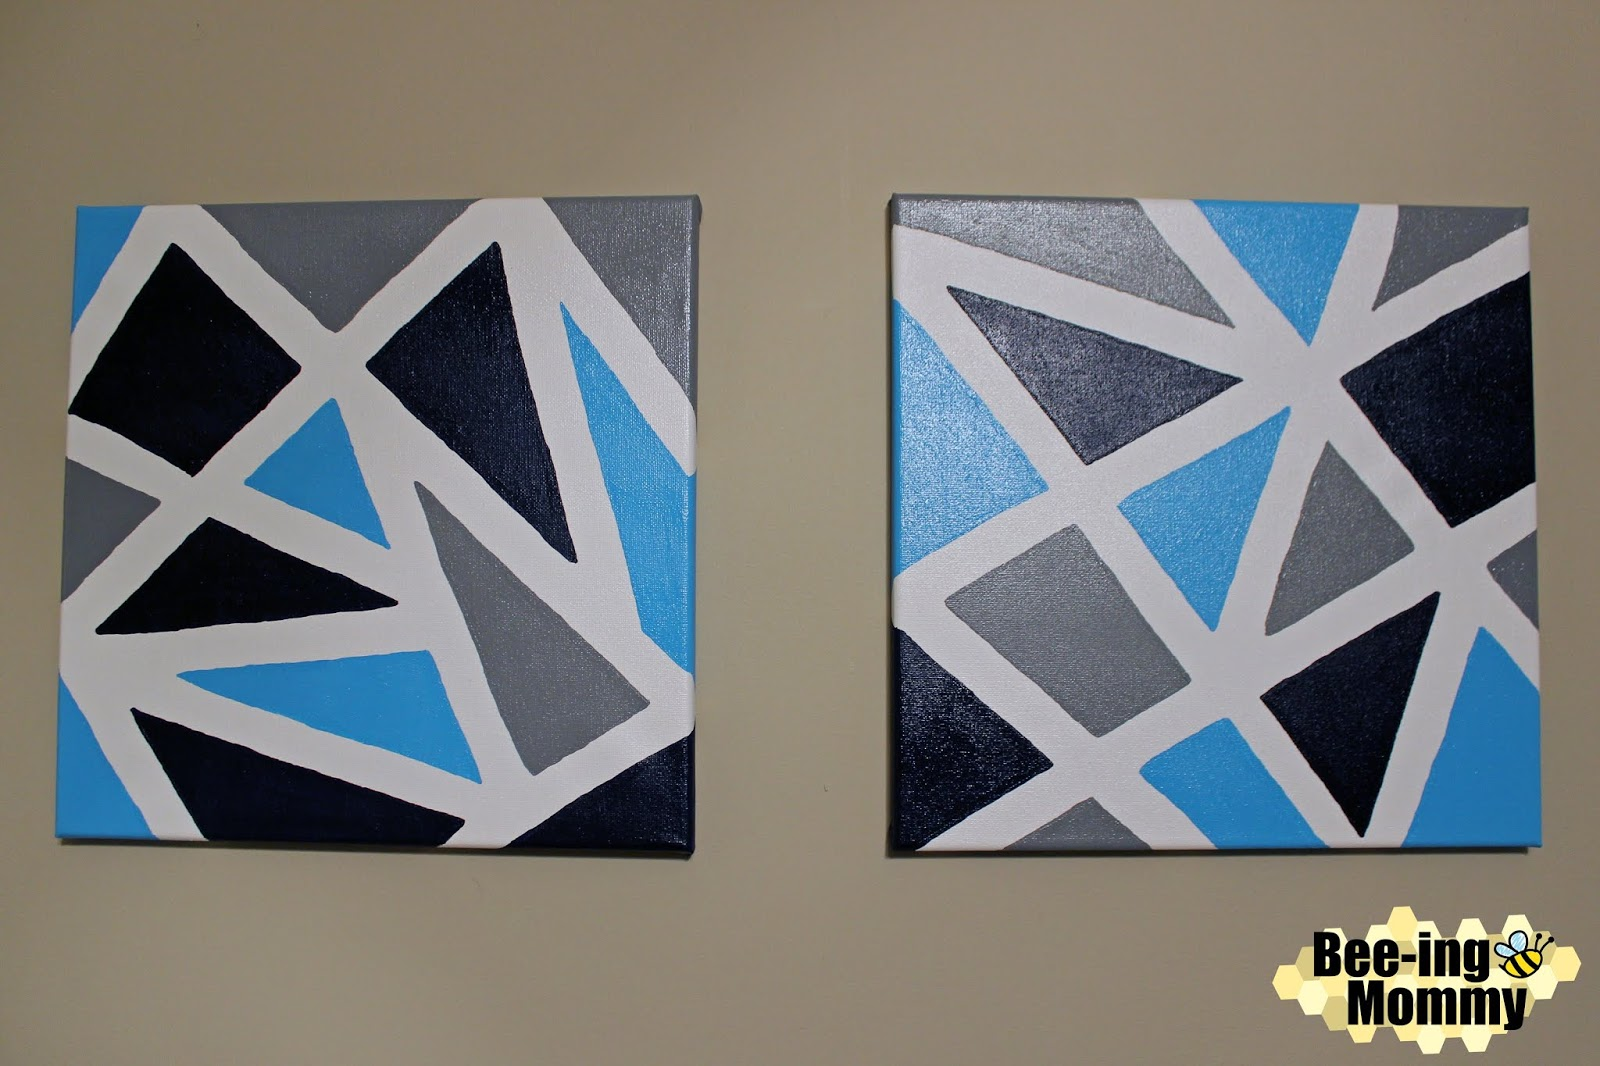 Geometric Wall Decor Using Painters Tape,How To Add Backsplash Tile